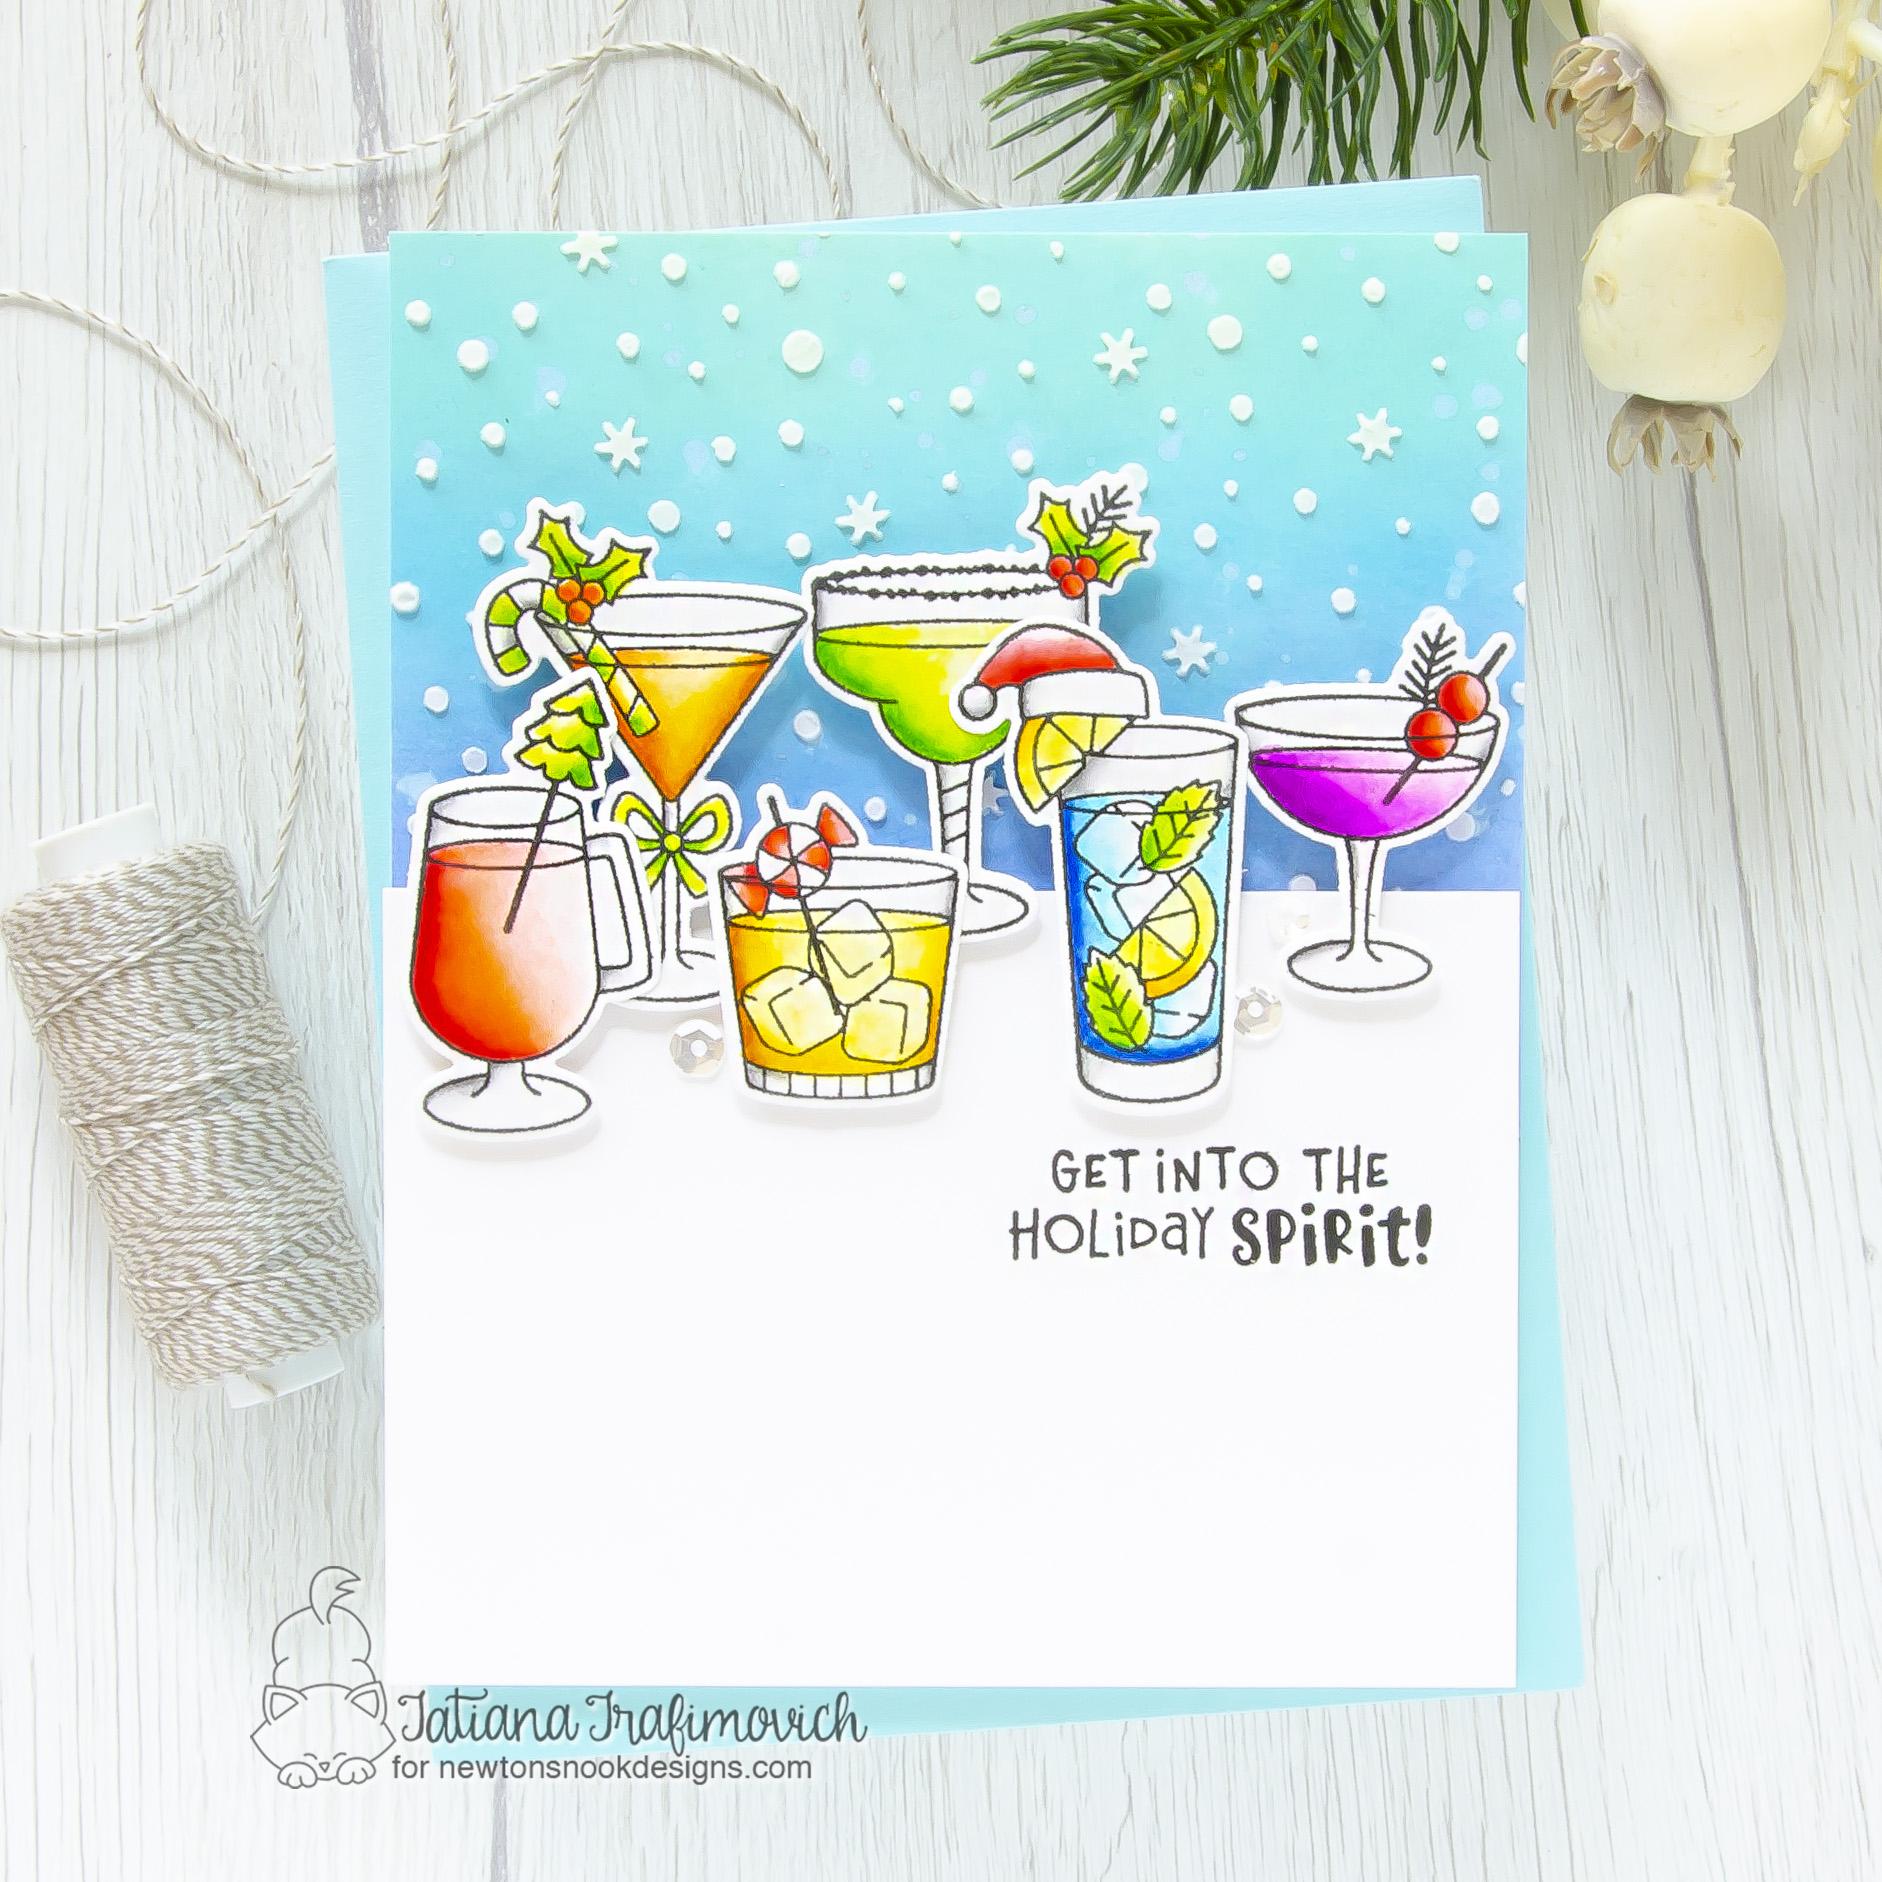 Get Into The Holiday Spirit! #handmade card by Tatiana Trafimovich #tatianacraftandart - Christmas Cocktails stamp set by Newton's Nook Designs #newtonsnook